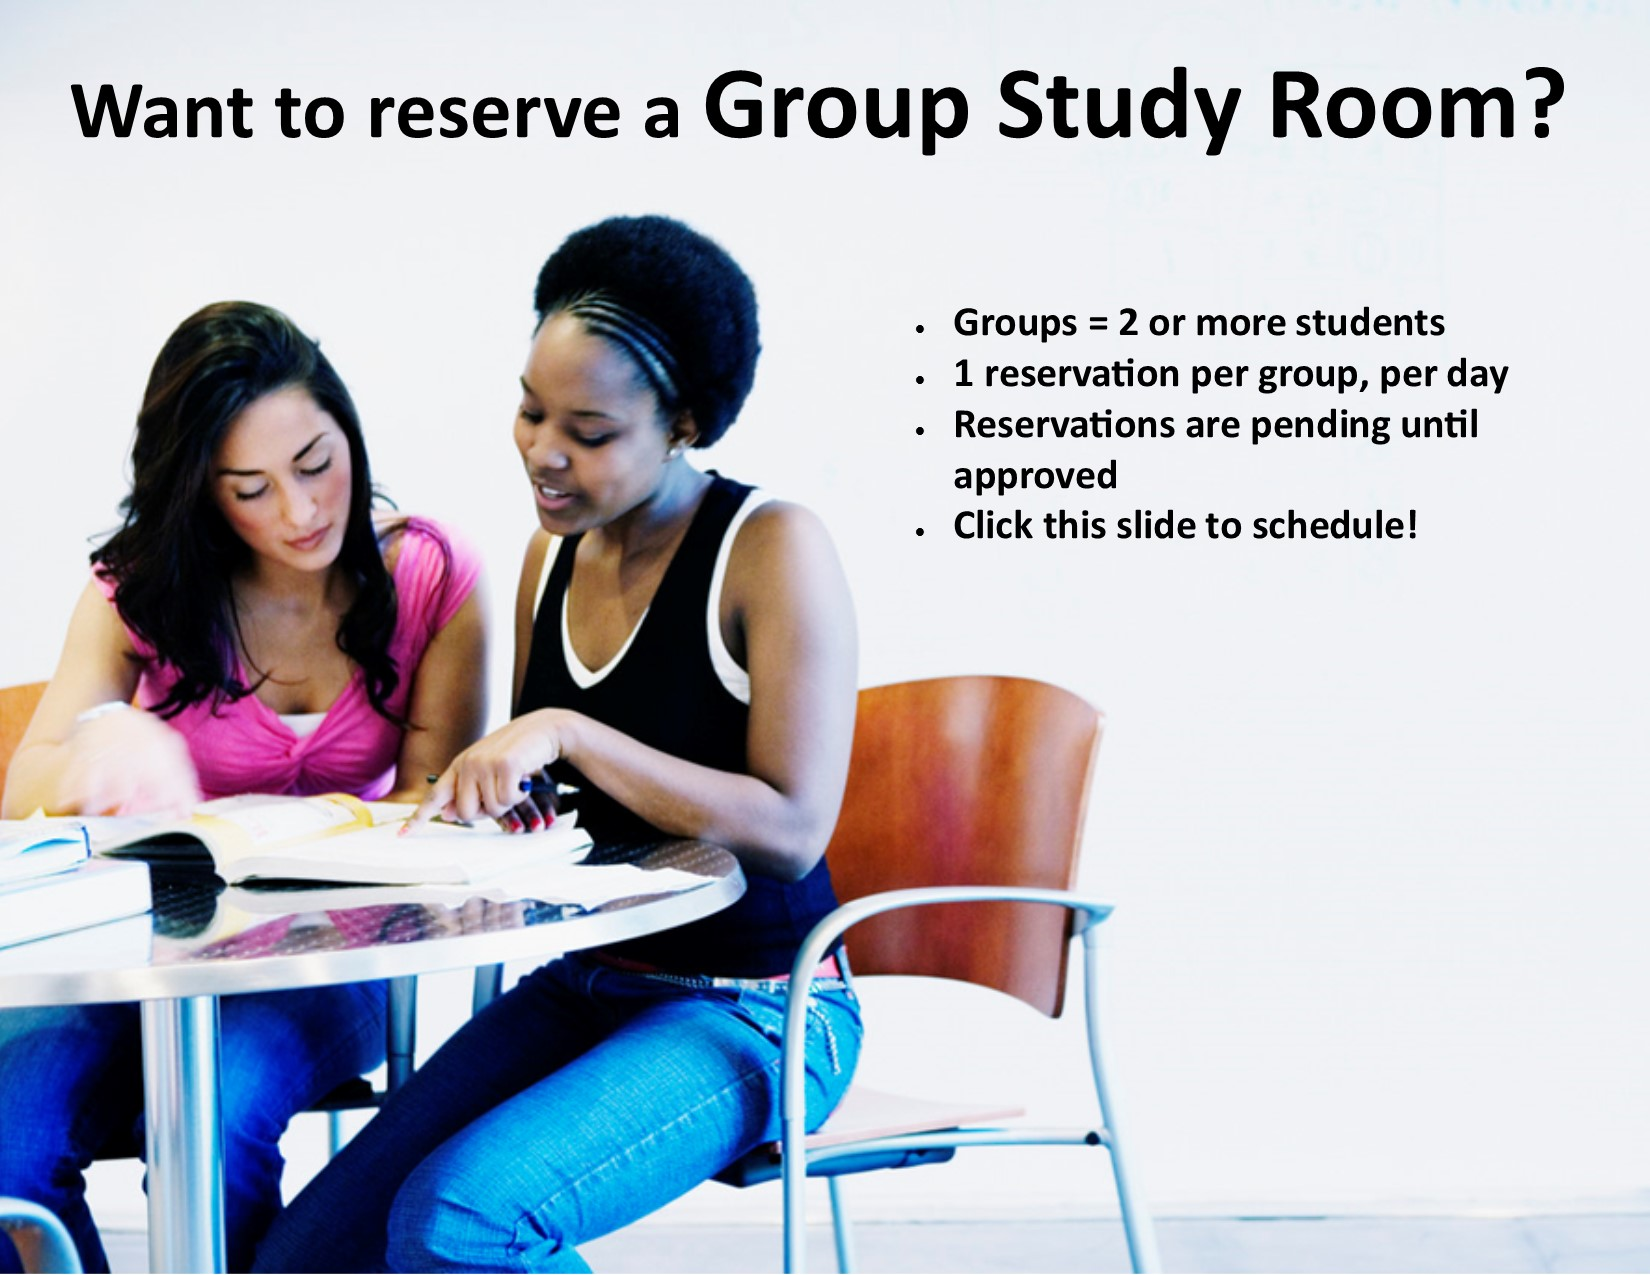 Group study room reservation link